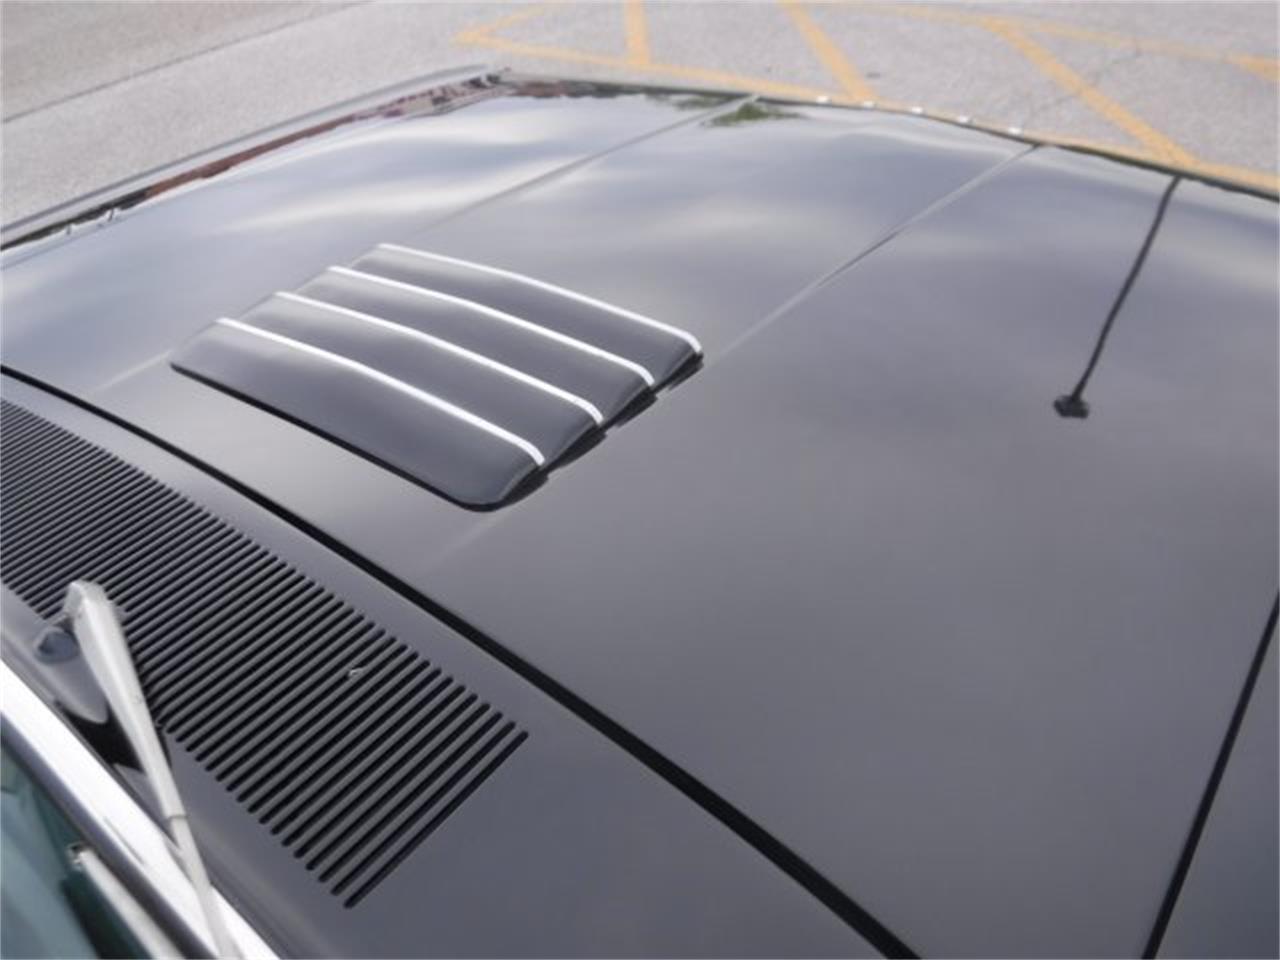 Large Picture of Classic '67 Dodge Coronet R/T - $55,500.00 - QZLZ